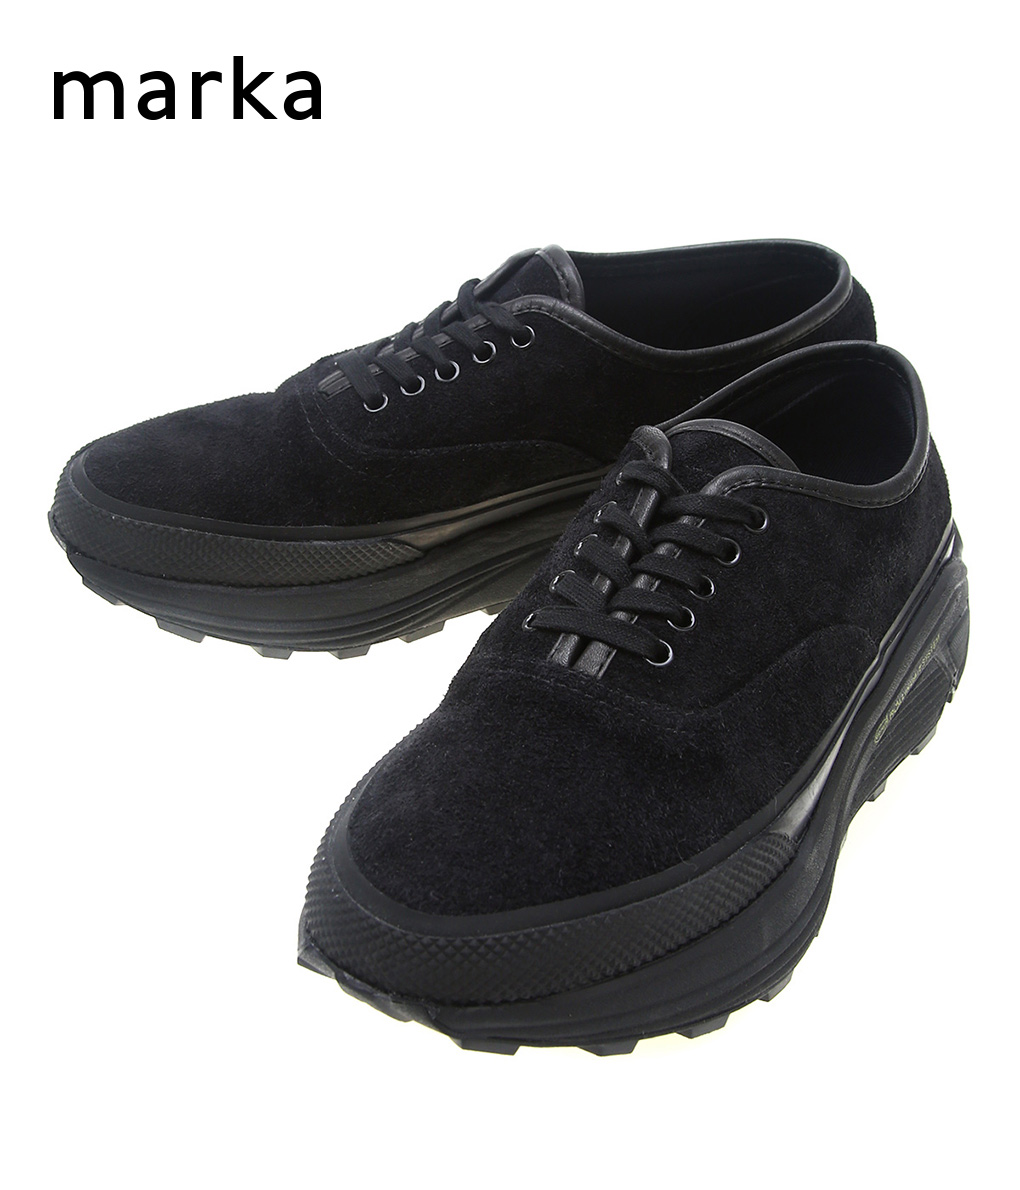 marka / マーカ : DOUBLE SOLE SNEAKERS DECK - cow hide - : マーカ 靴 ダブルソール スニーカー デック デッキシューズ メンズ : M19D-11BT01C【COR】【WIS】